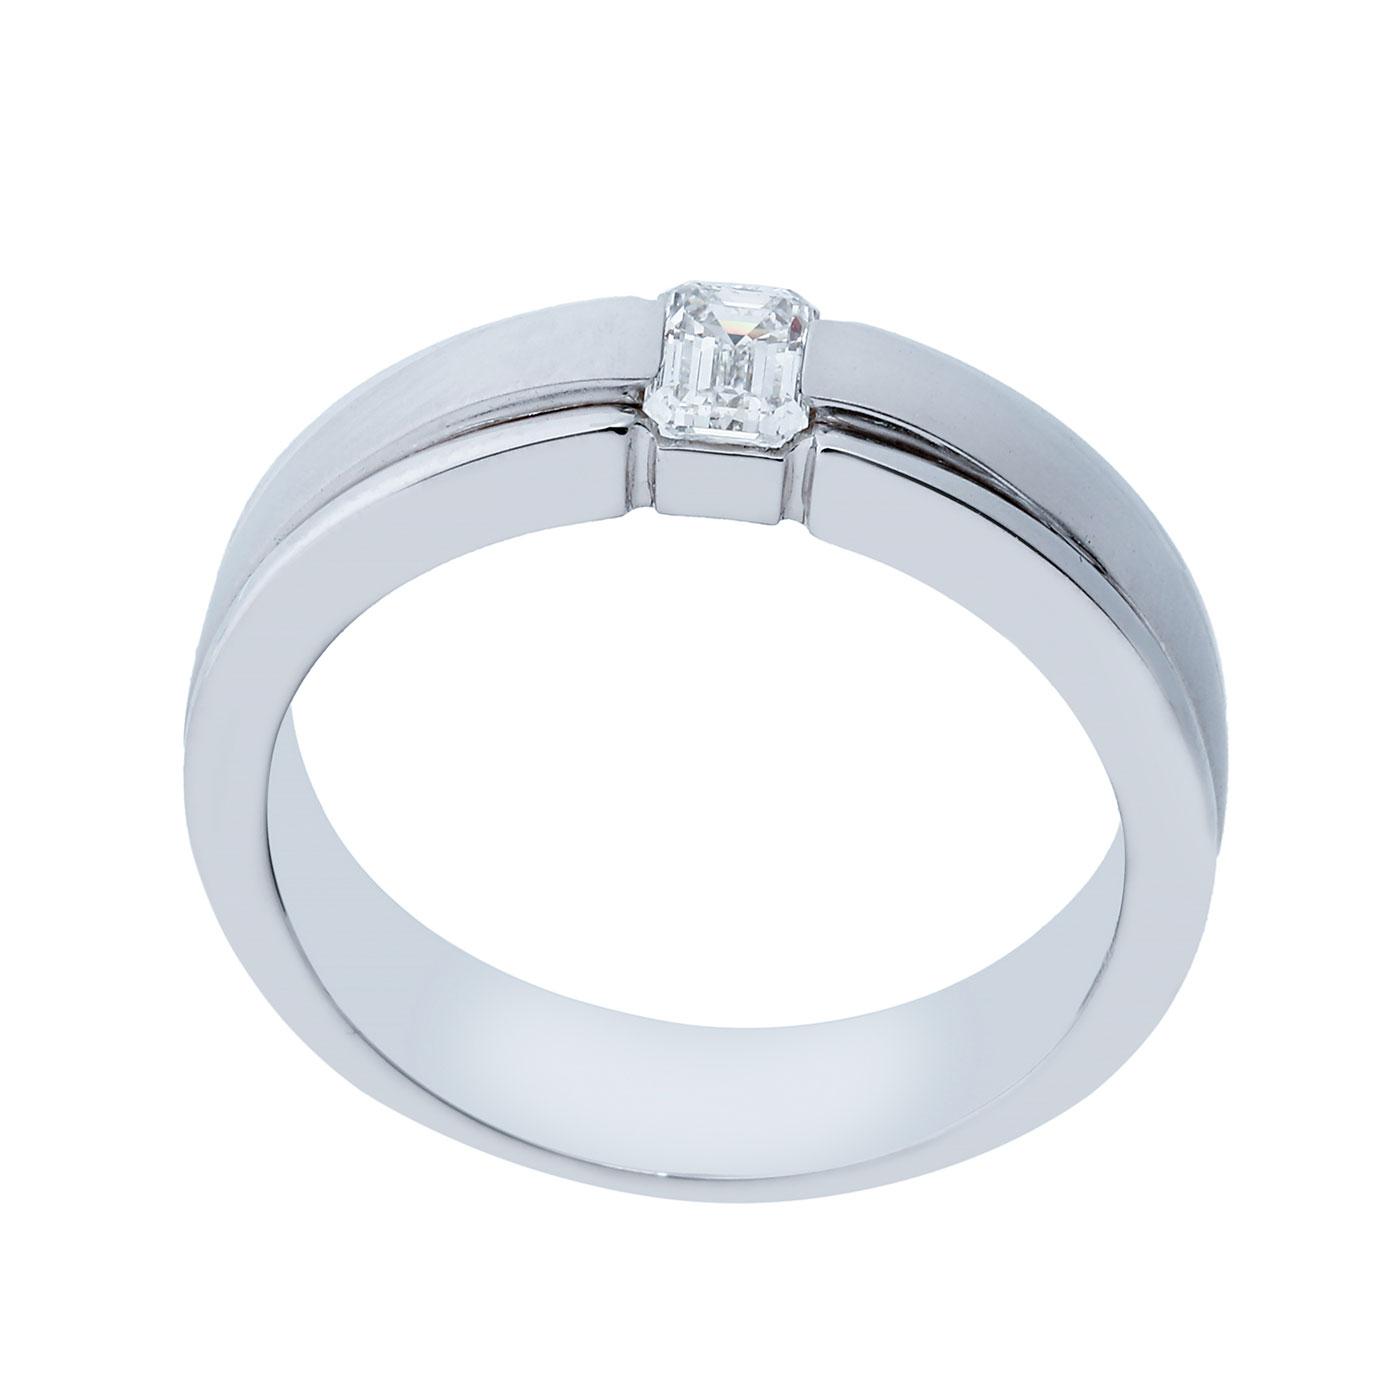 حلقه برليان 80406 C گوهربين goharbin